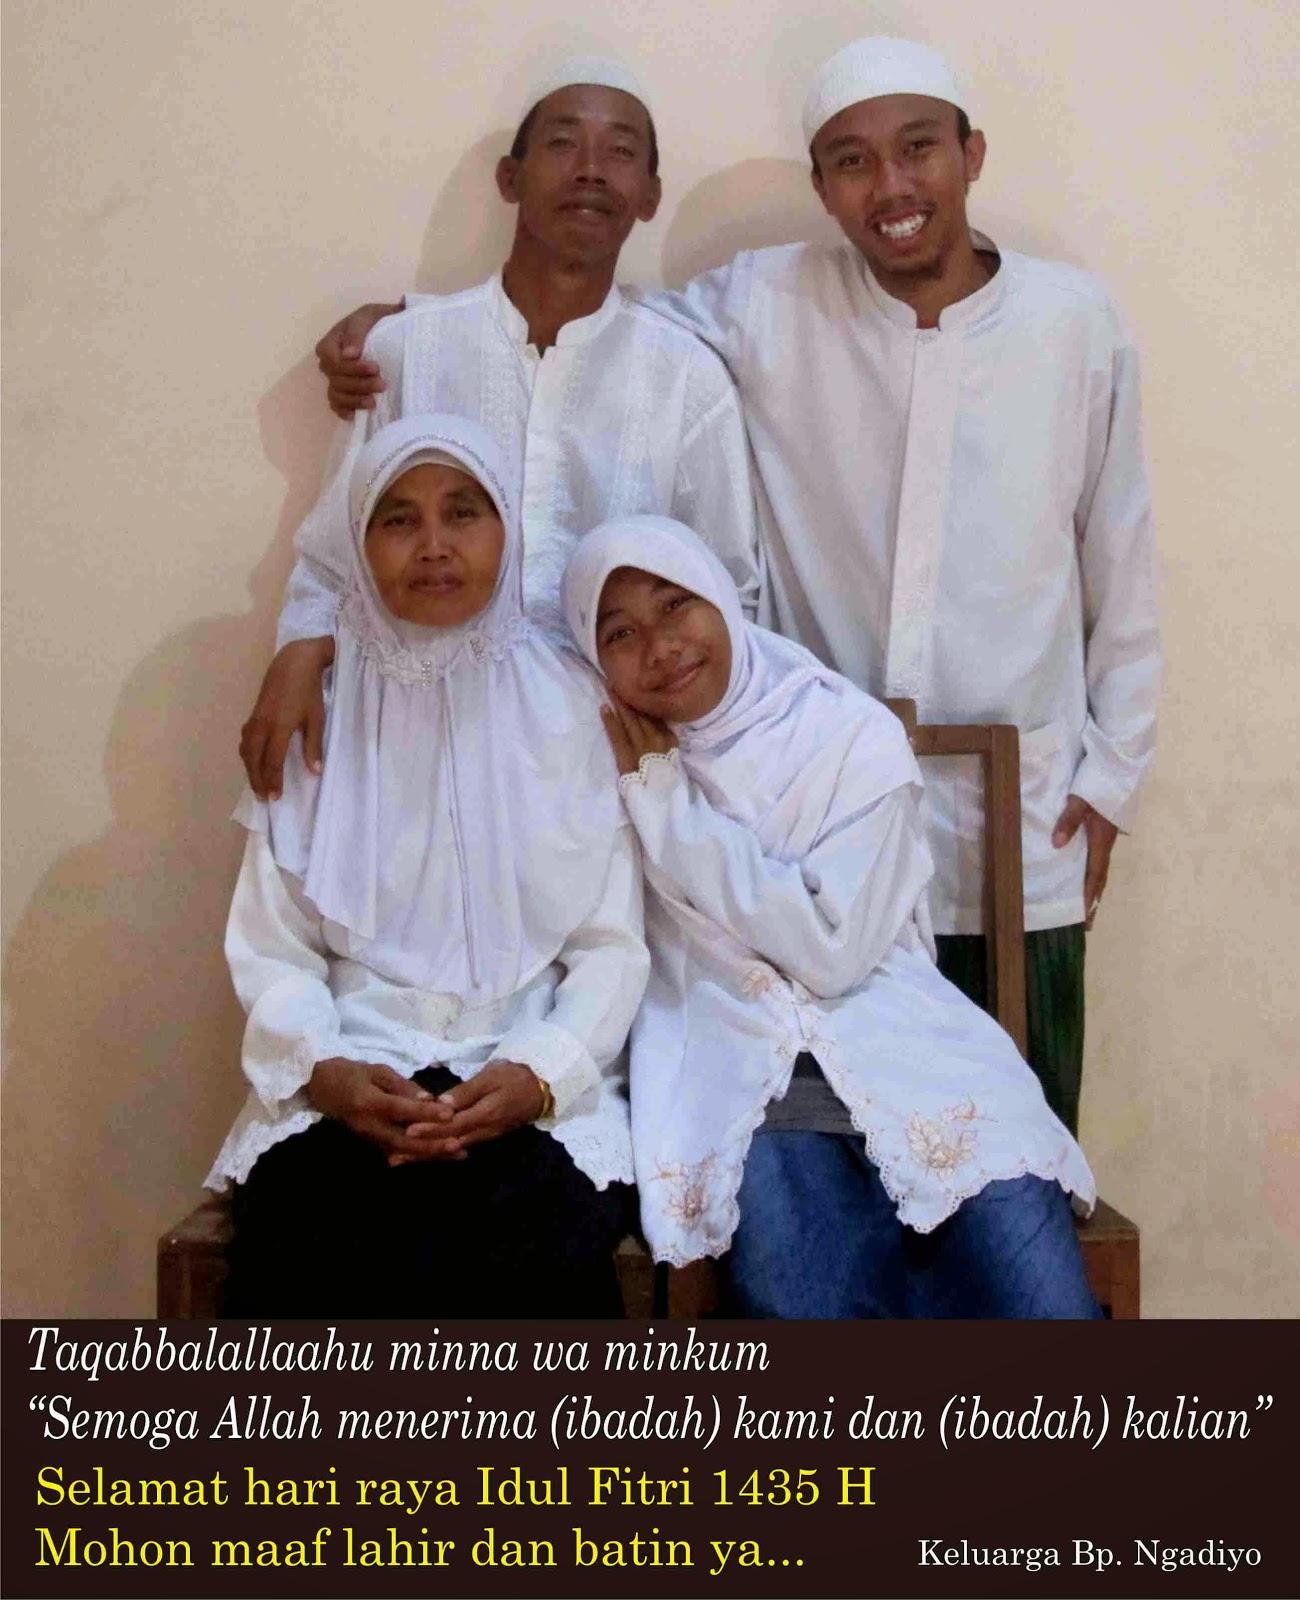 Makna Idul Fitri Bagi Keluarga Kami - Janu Muhammad